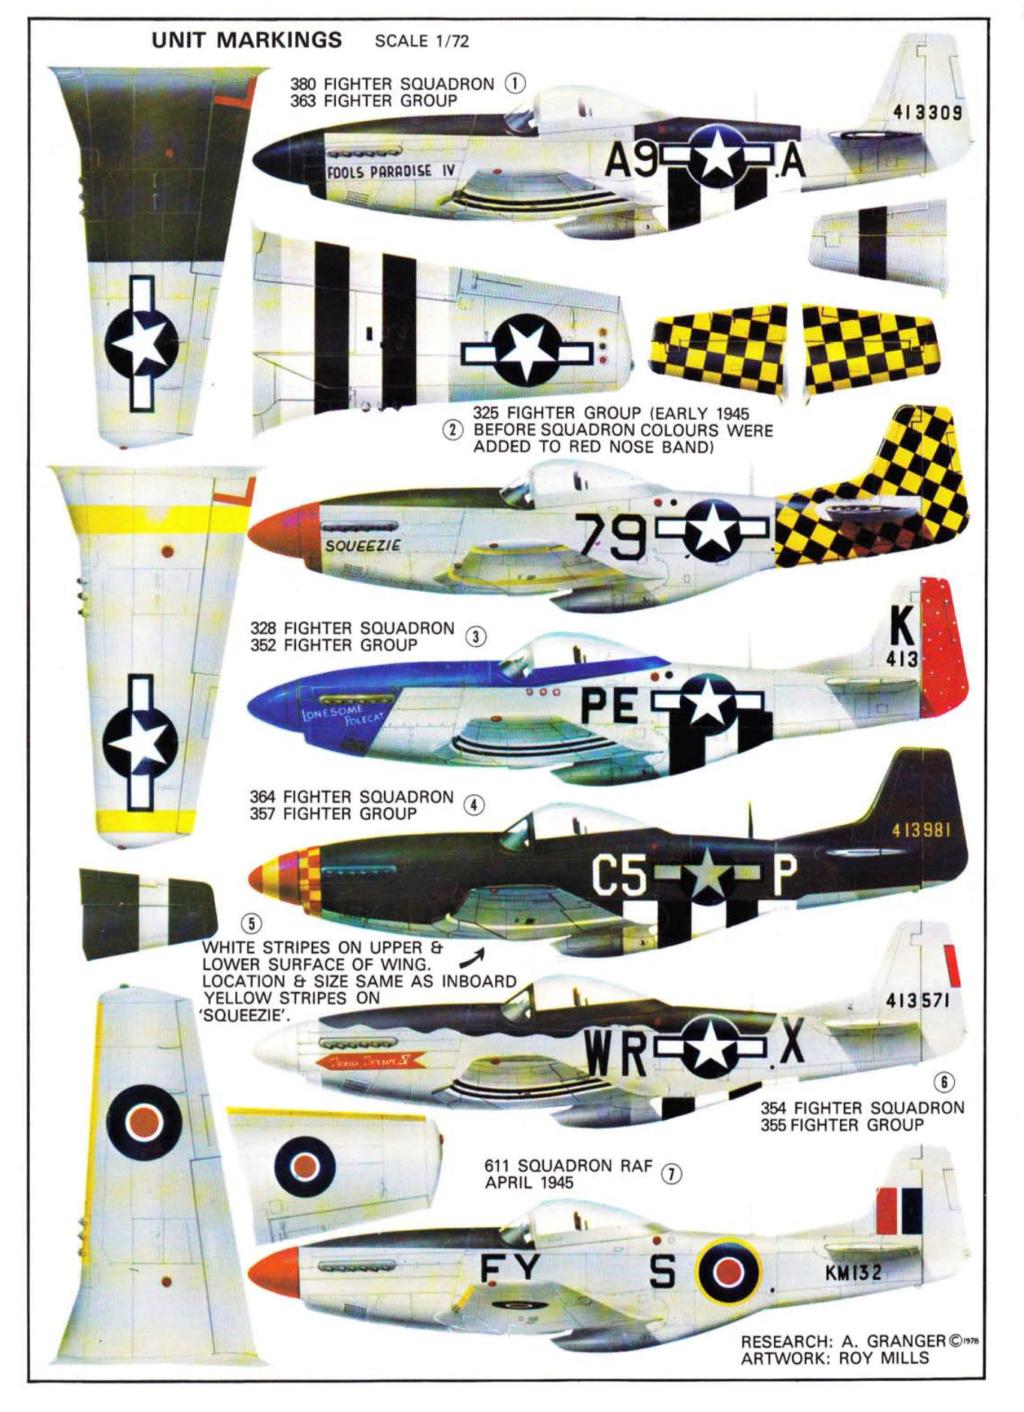 NORTH AMERICAN P-51 MUSTANG 22389c10